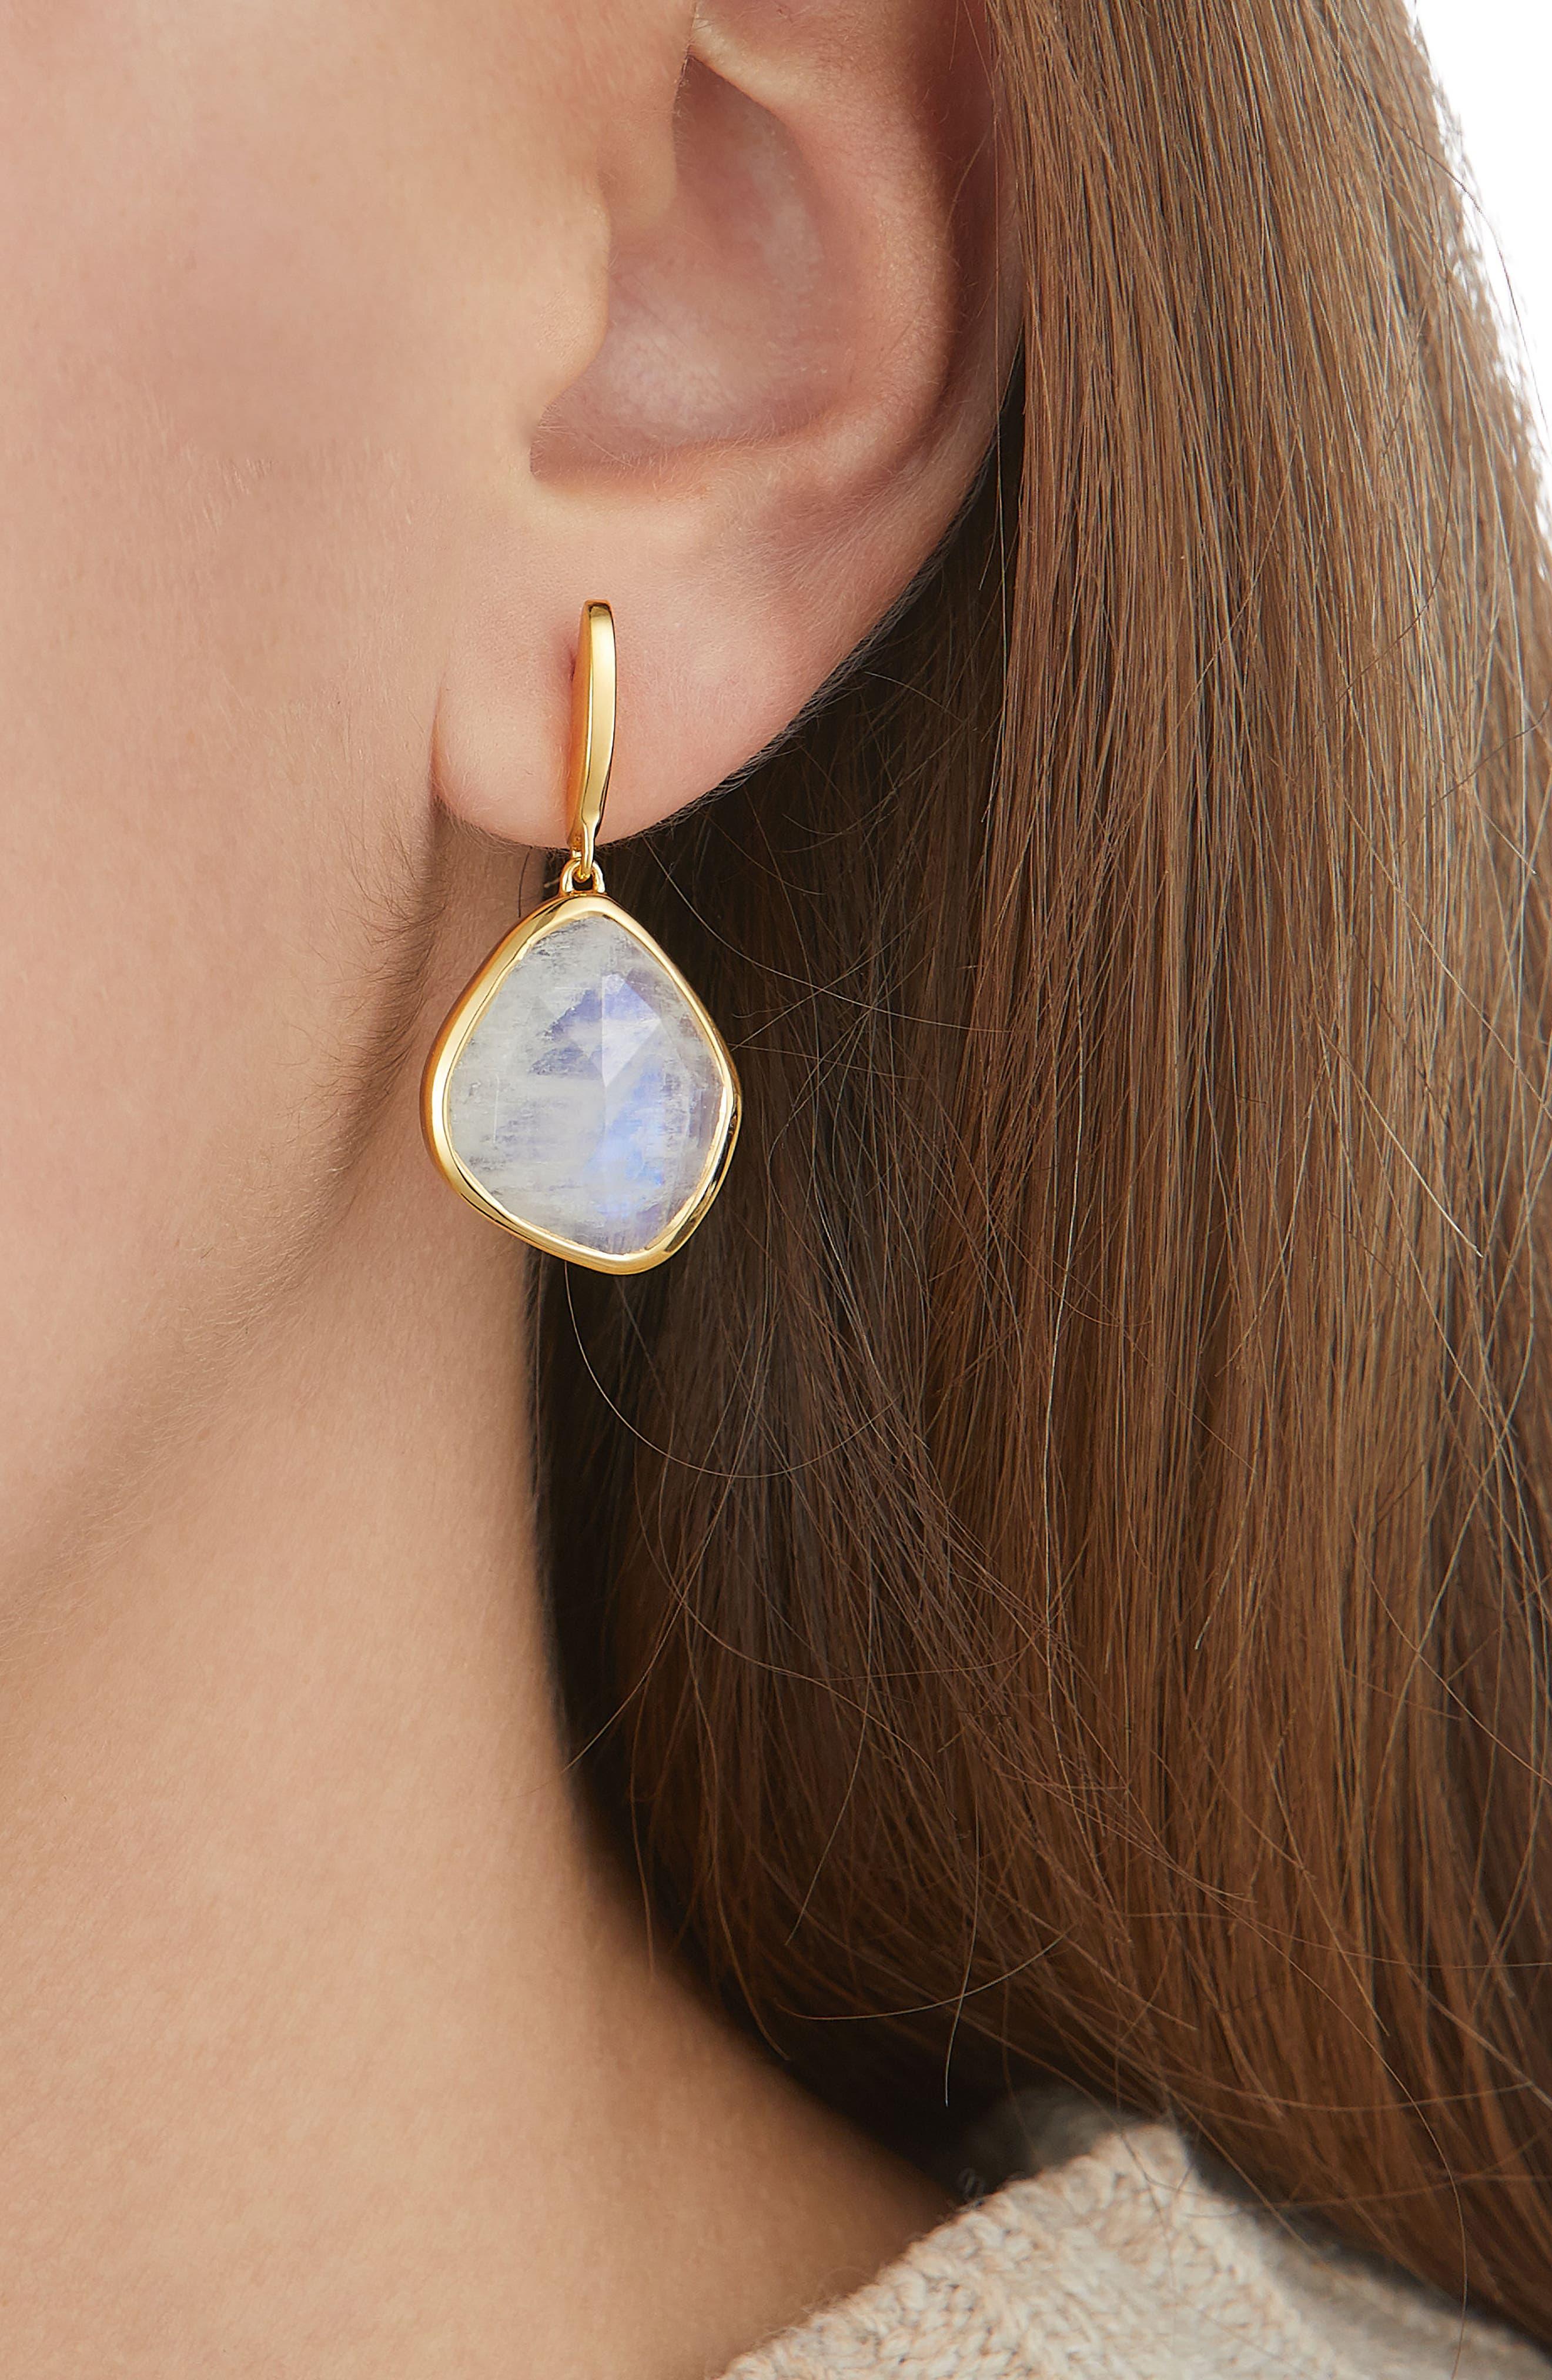 Siren Nugget Semiprecious Stone Drop Earrings,                             Alternate thumbnail 3, color,                             Yellow Gold/ Moonstone